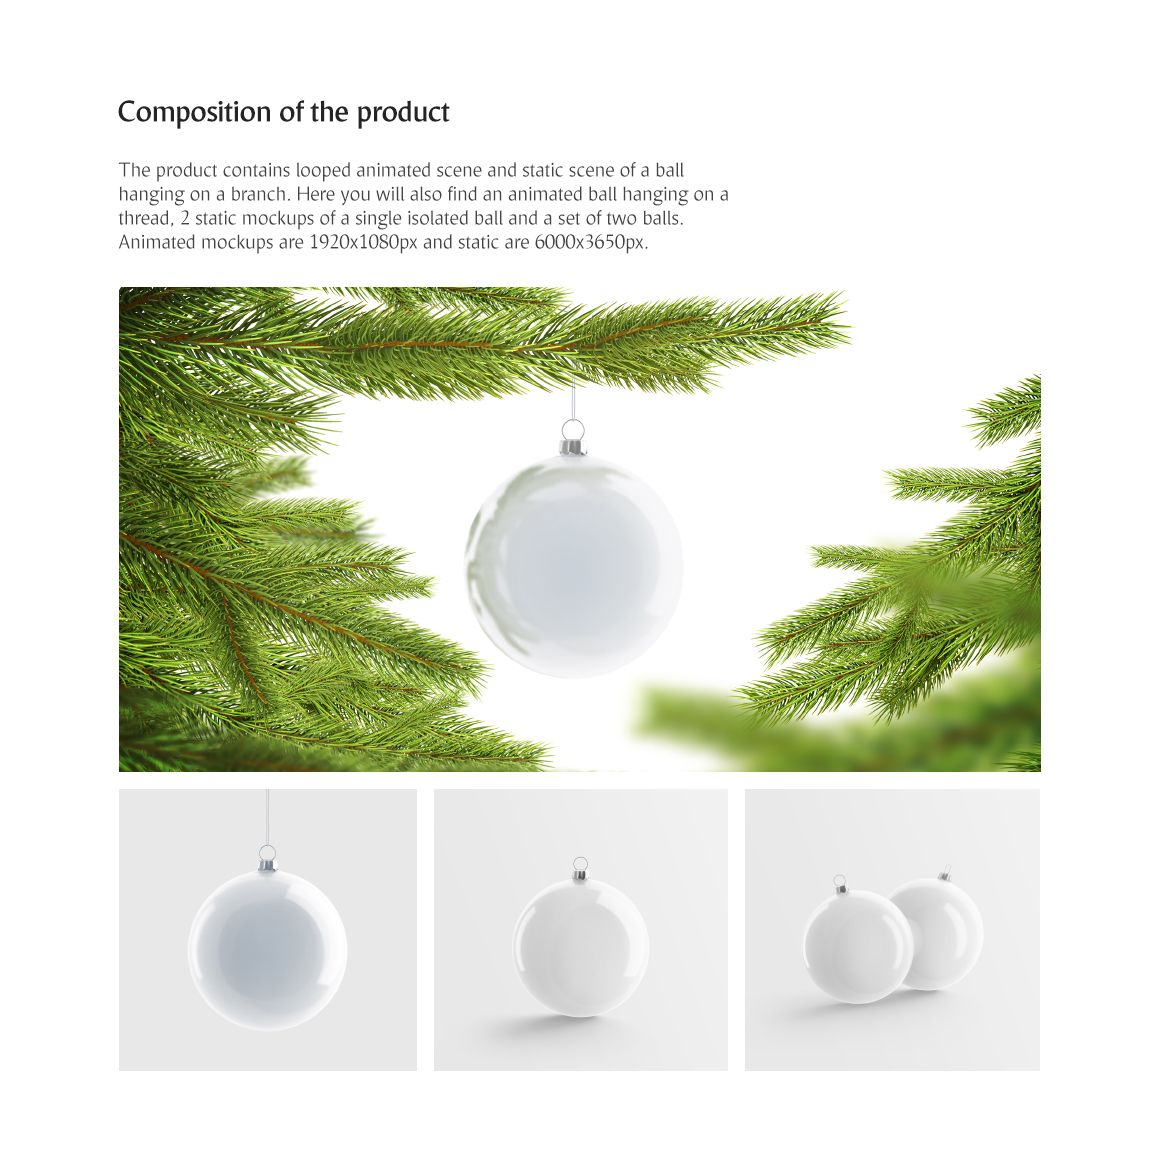 Christmas Ball Animated Product Mockup 74174 Stationery Mockup Animation Types Colorful Backgrounds